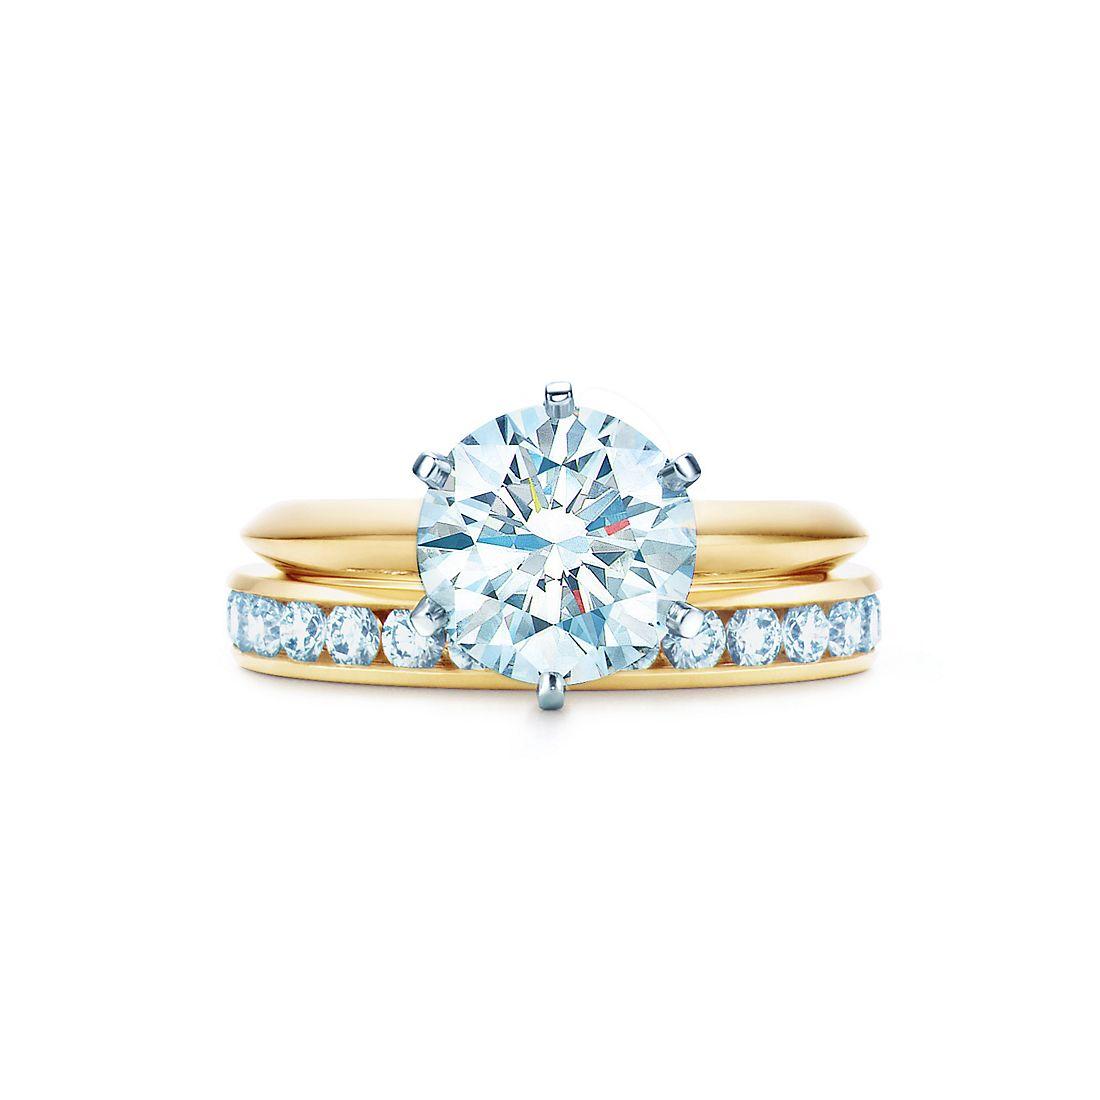 Der Tiffany Setting In 18 Karat Gelbgold Verlobungsringe Tiffany